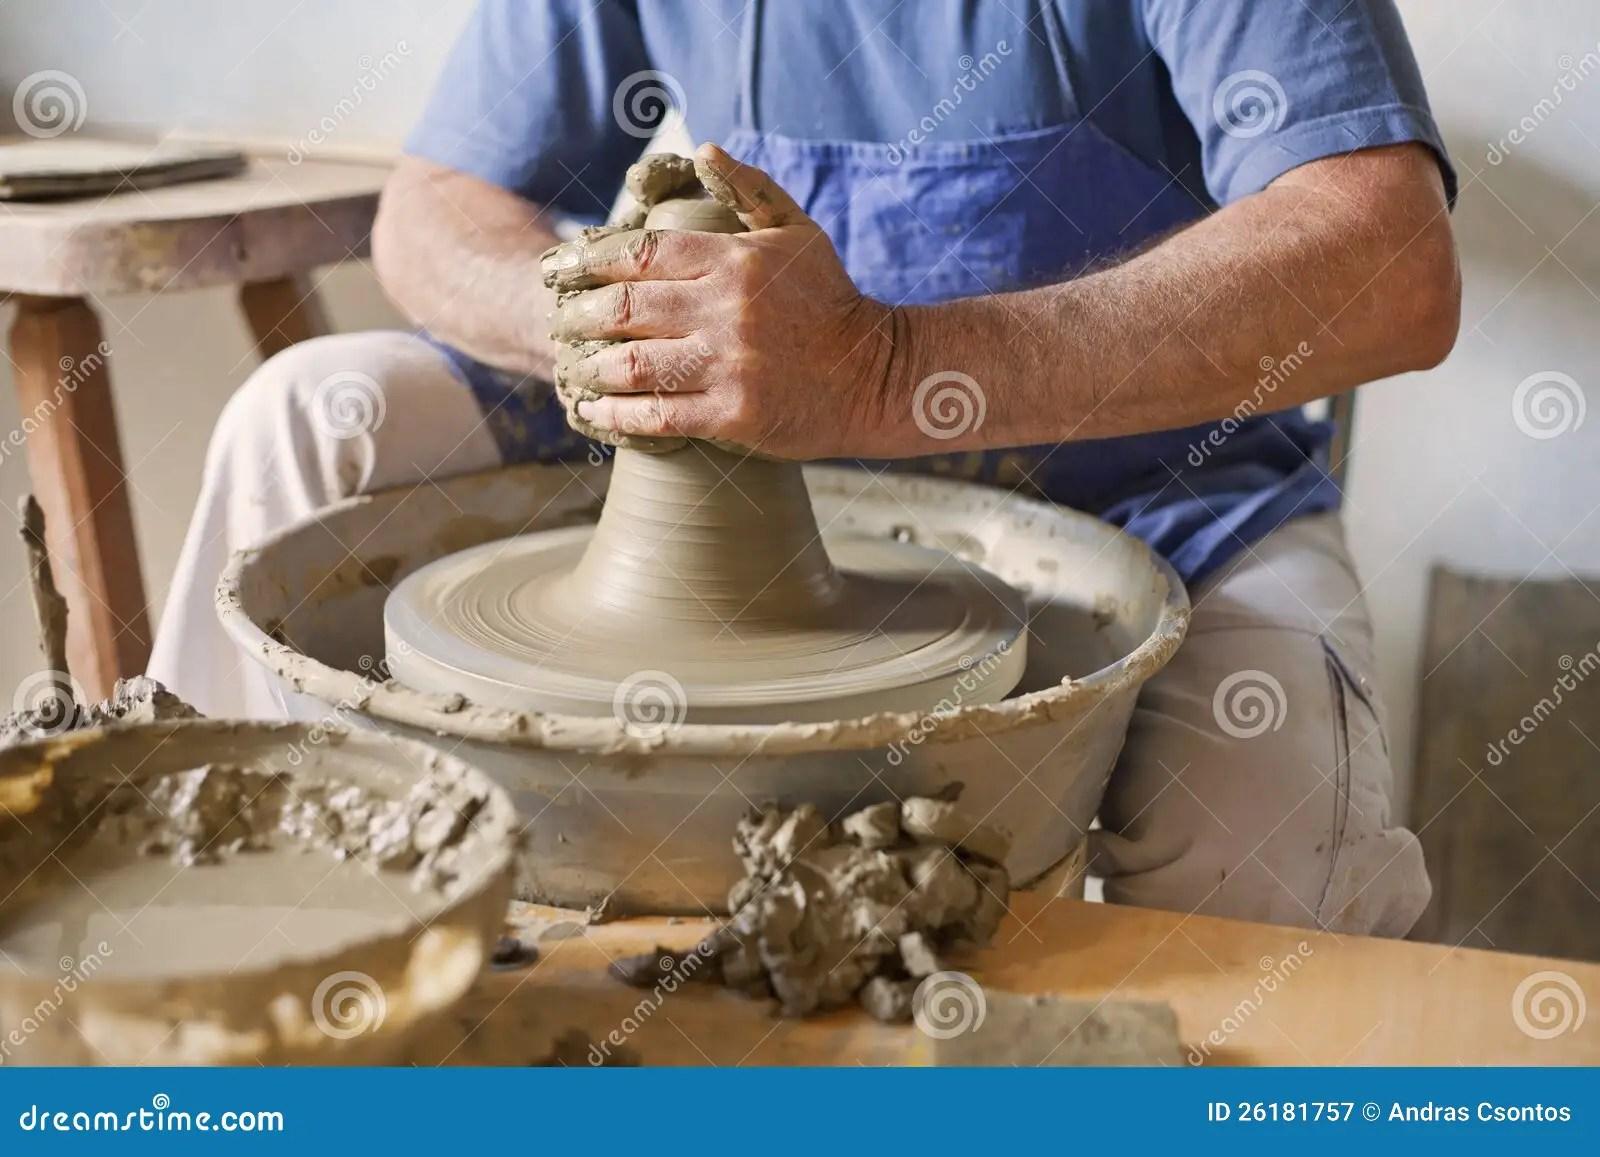 Working Clay Worksheet